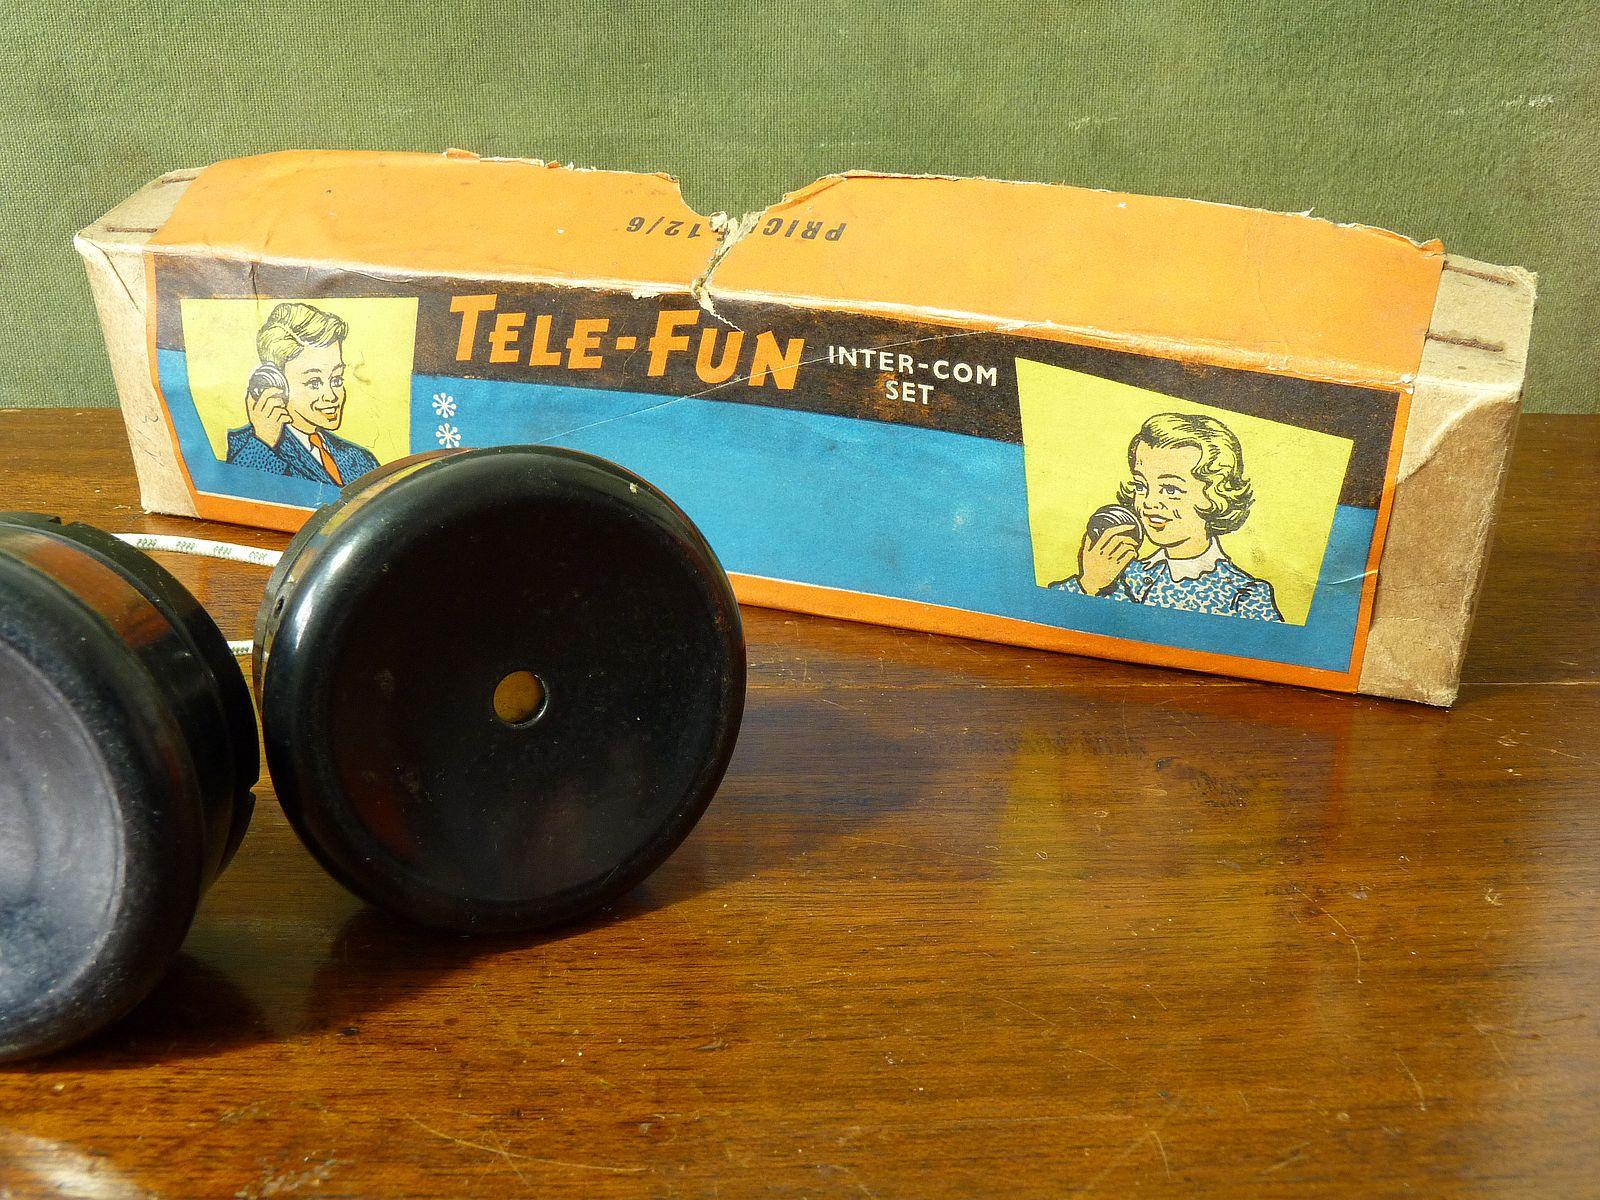 Vintage Tele-Fun Intercom Set